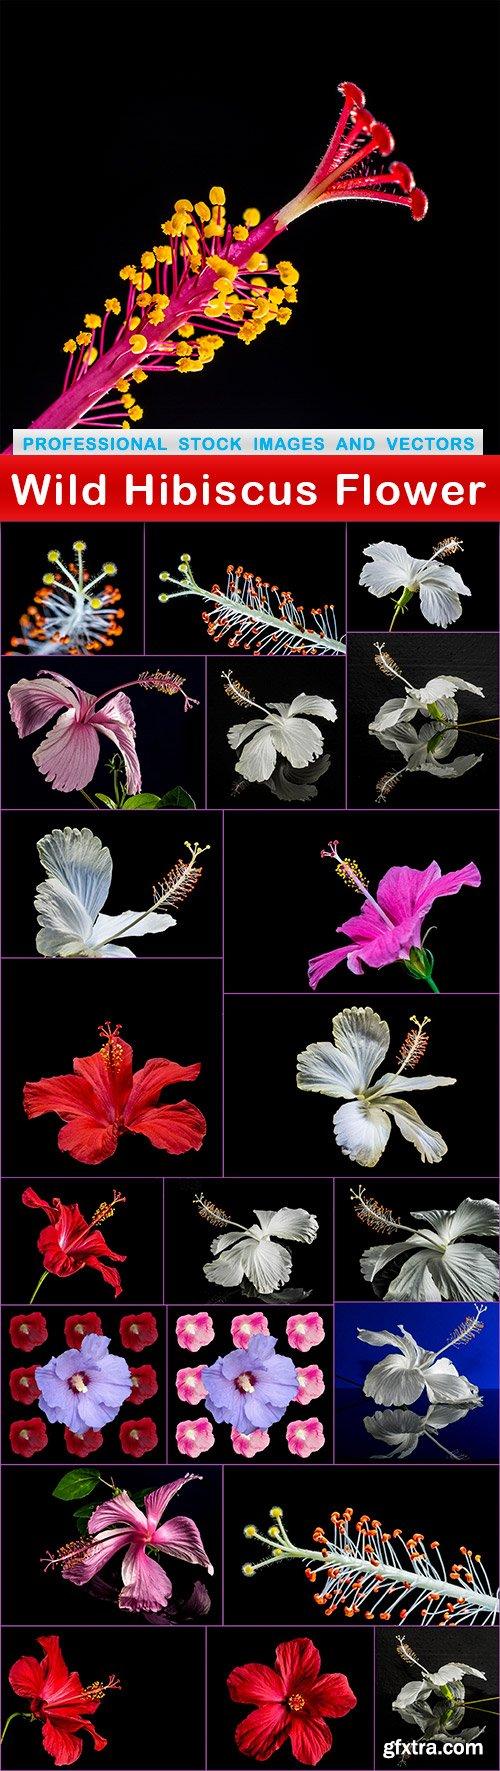 Wild Hibiscus Flower - 22 UHQ JPEG